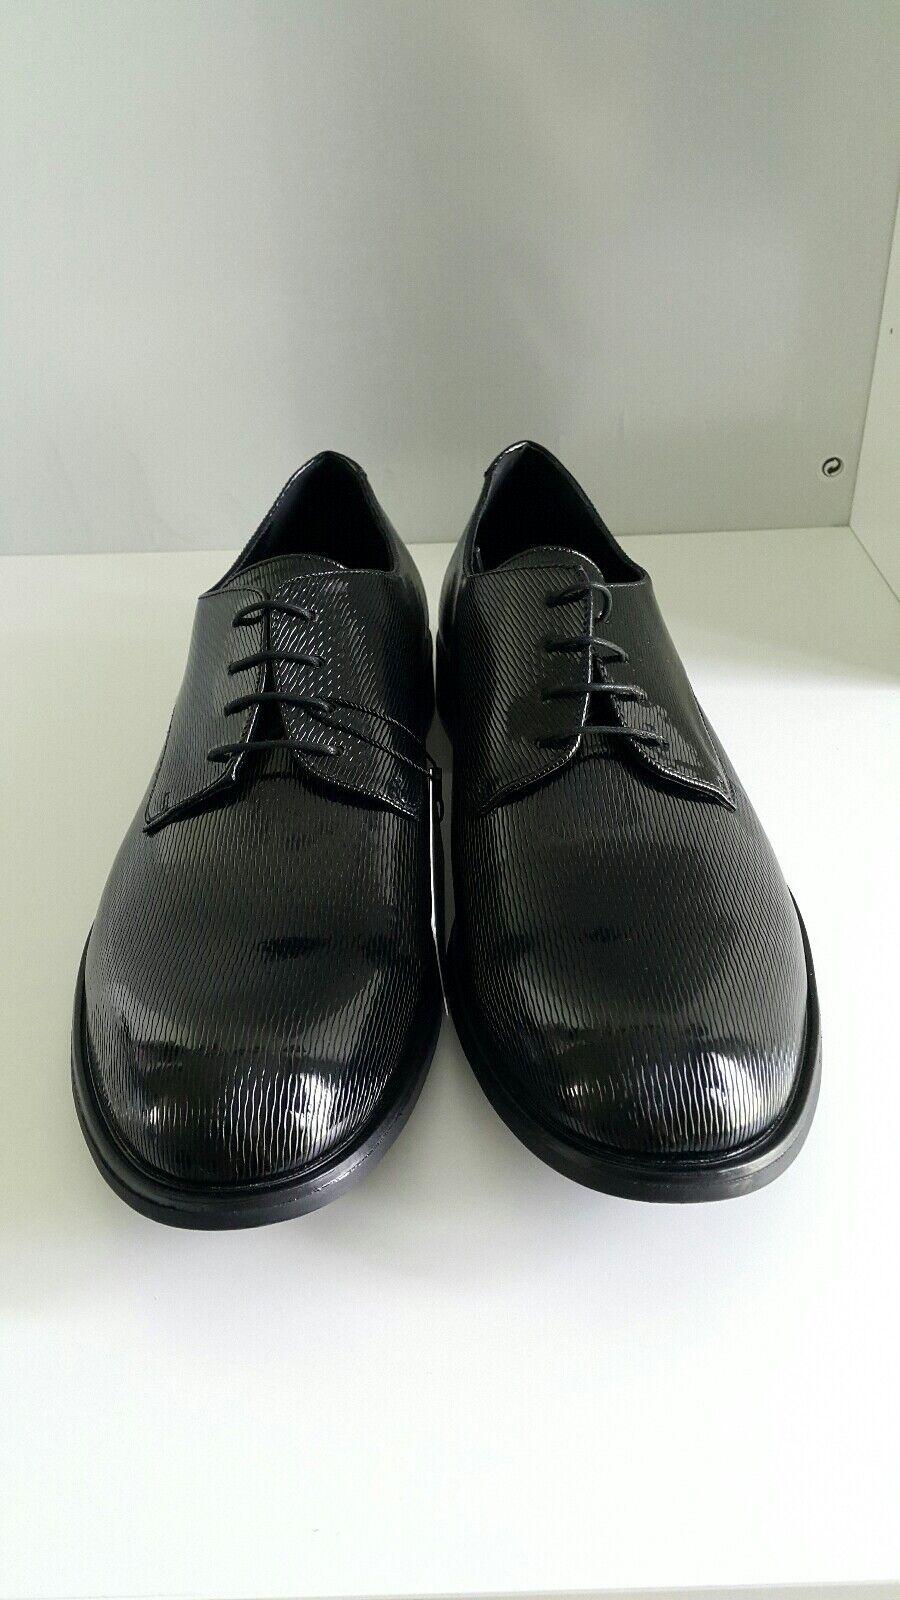 ZARA HOMME noir Dressy Chaussures Taille 11.5